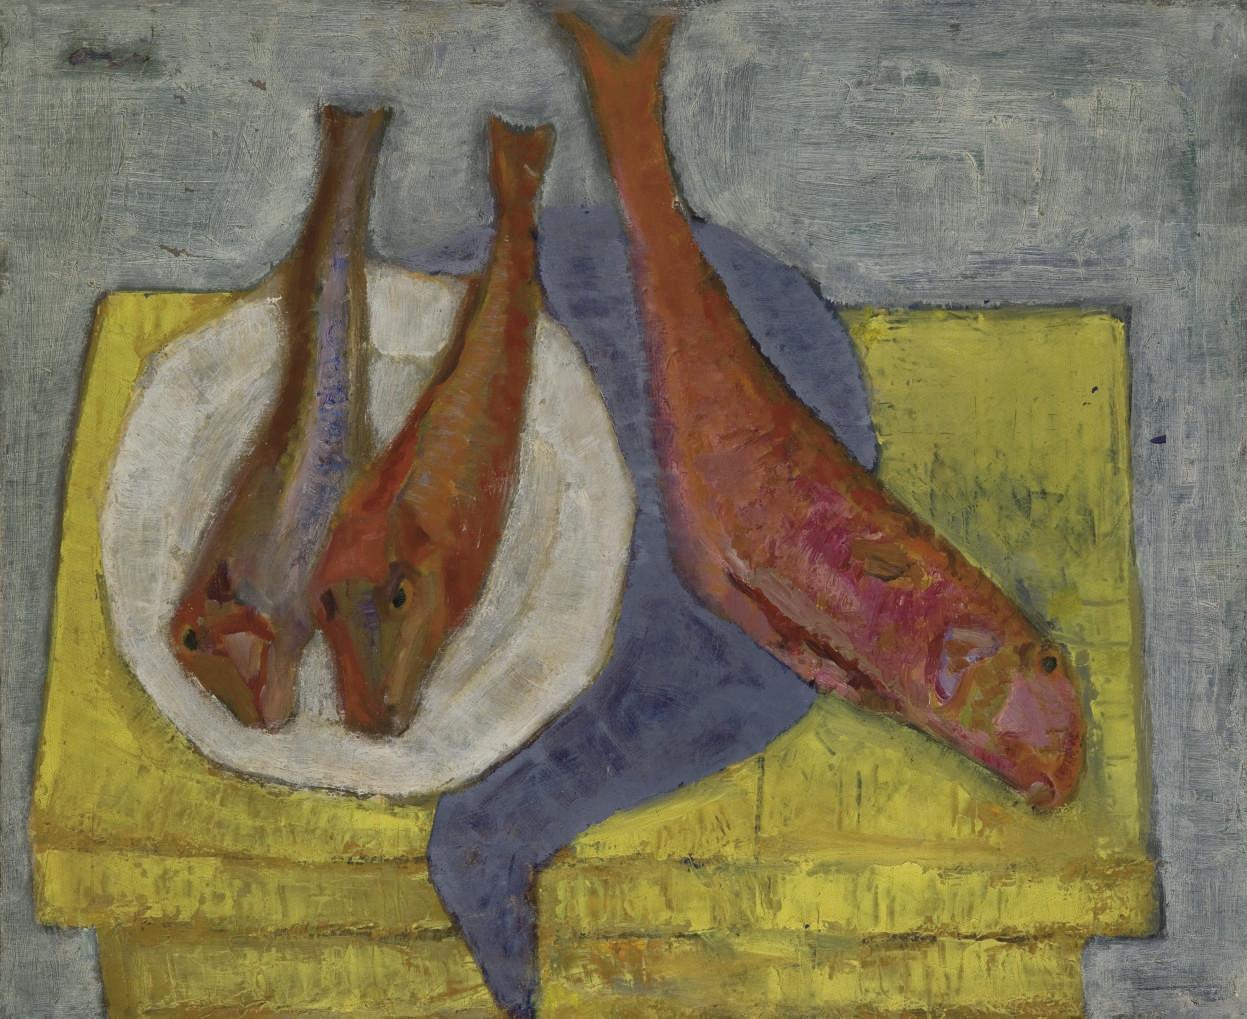 Still Life with Three Fish